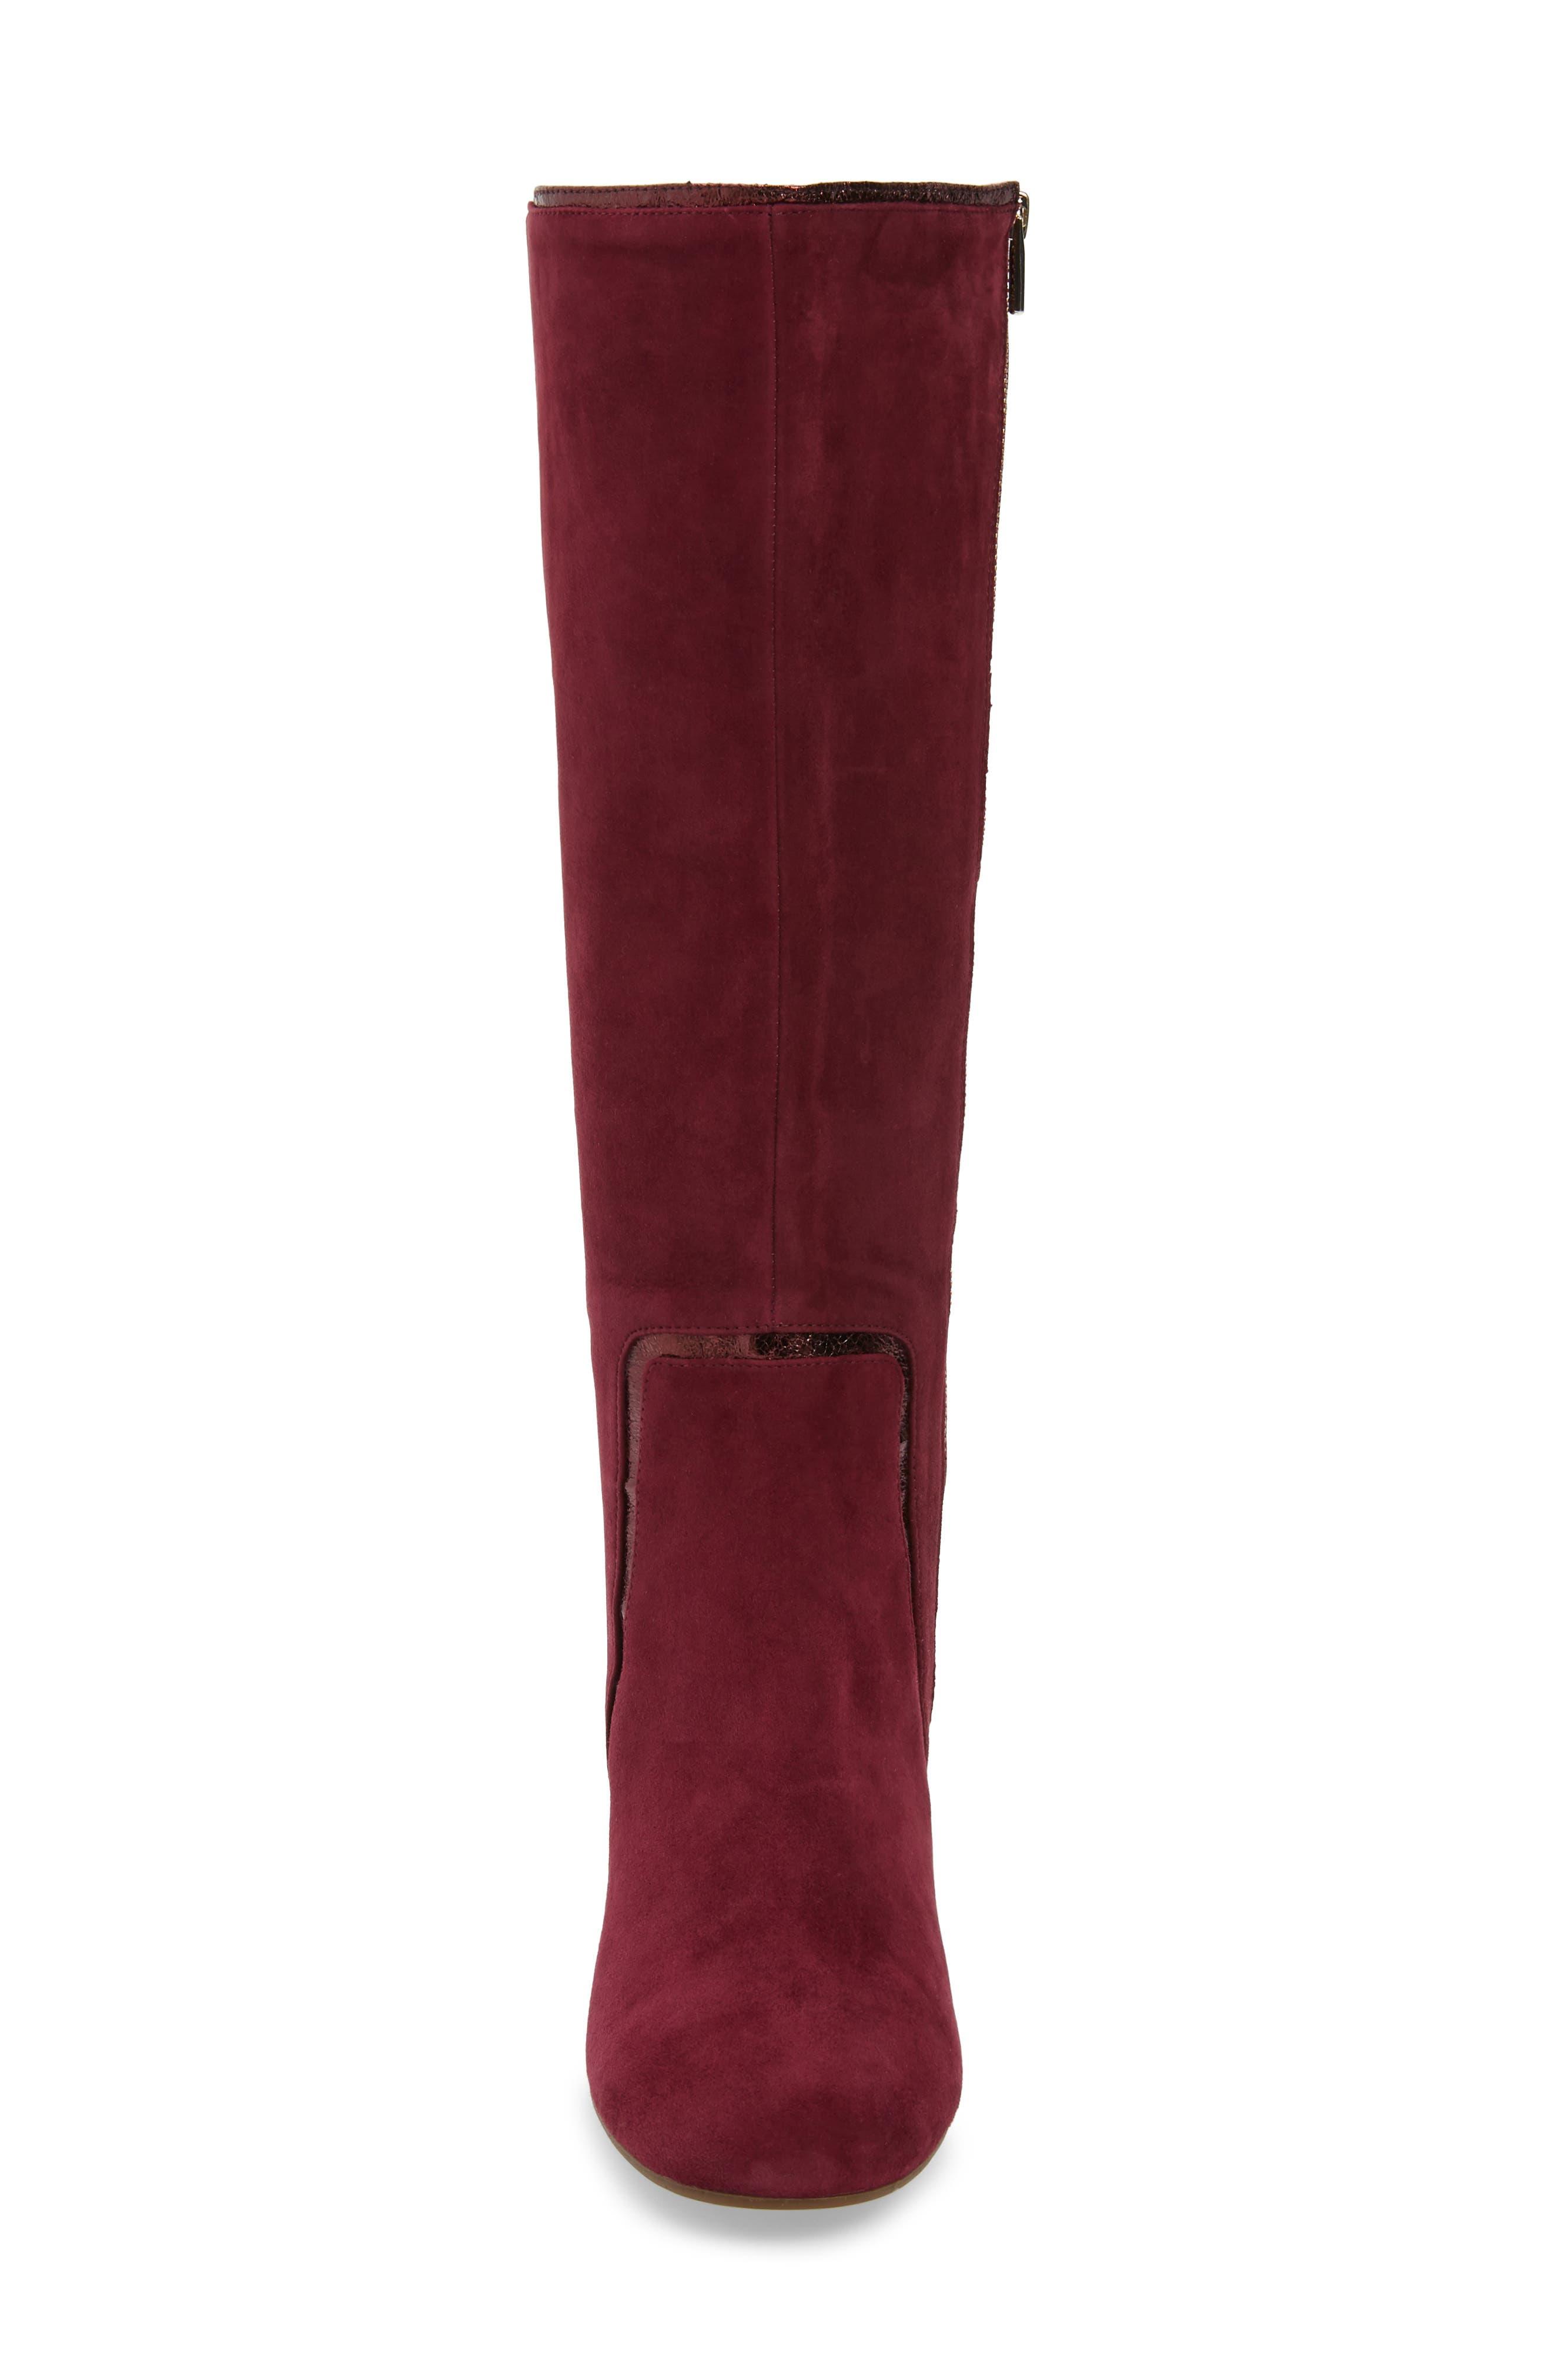 TARYN ROSE, Charlee Knee High Boot, Alternate thumbnail 4, color, FIG SUEDE